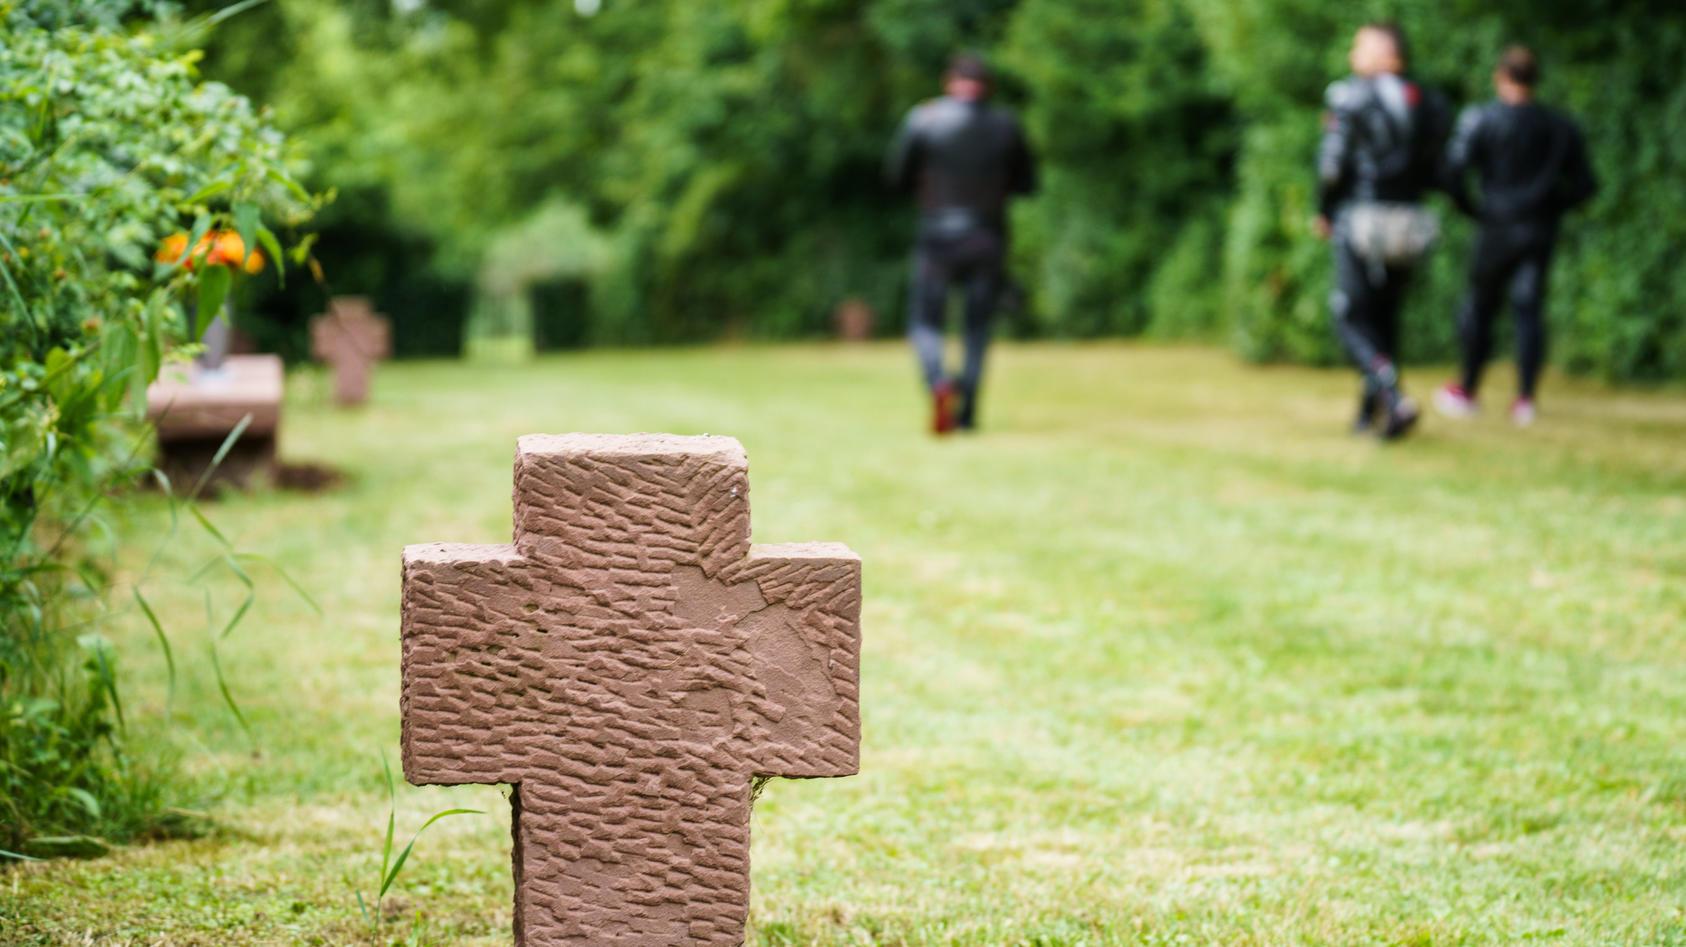 Frau auf Friedhof angezündet: 31-Jähriger in Psychiatrie (Symbolbild)